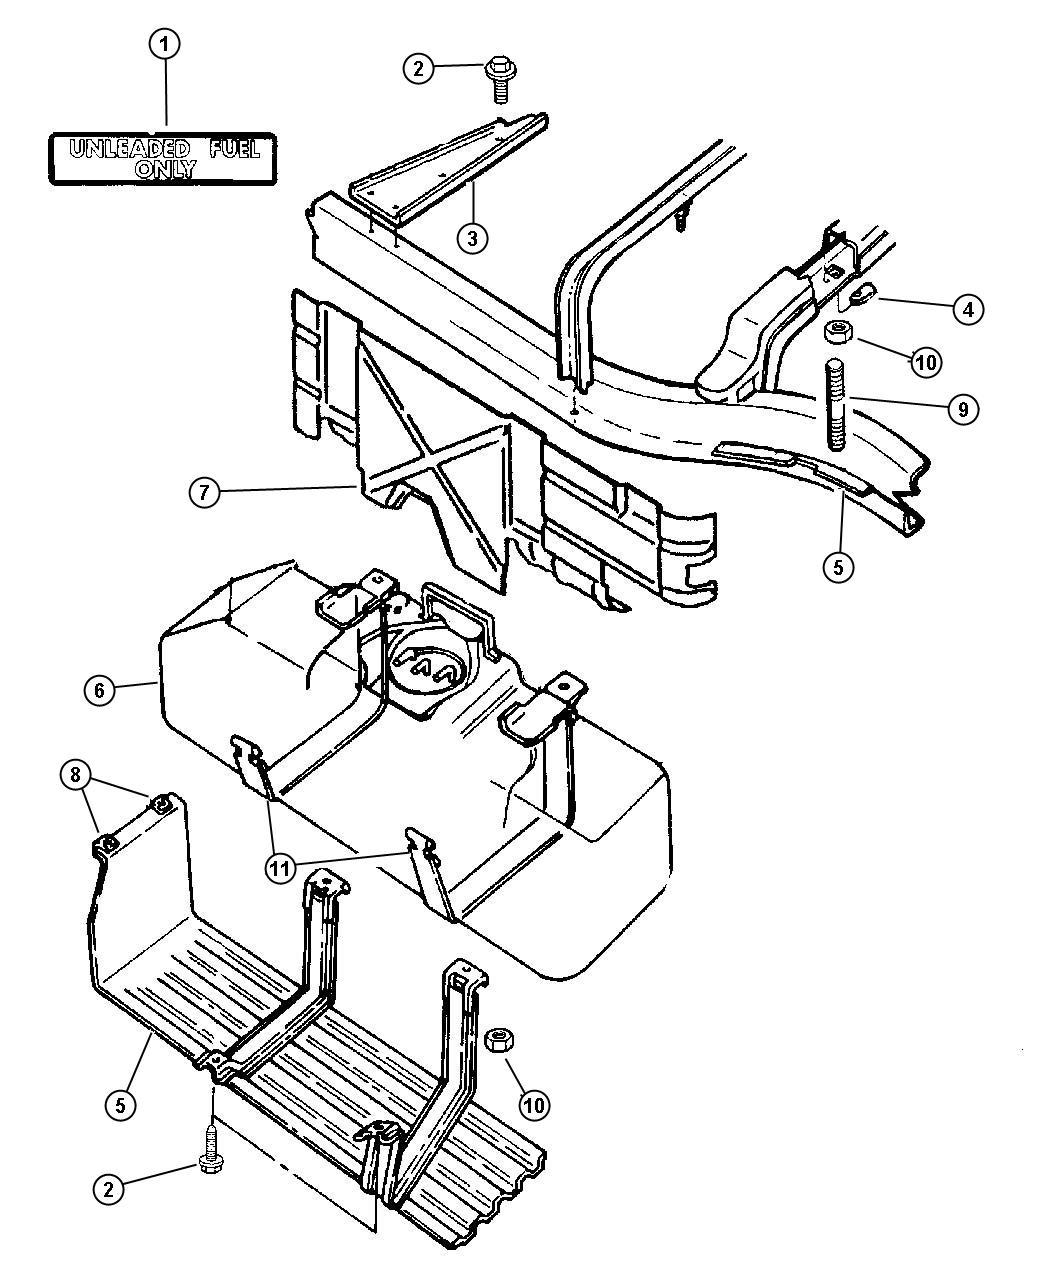 1987 Dodge Dakota Strap. Rear. Fuel tank. Strap, fuel tank